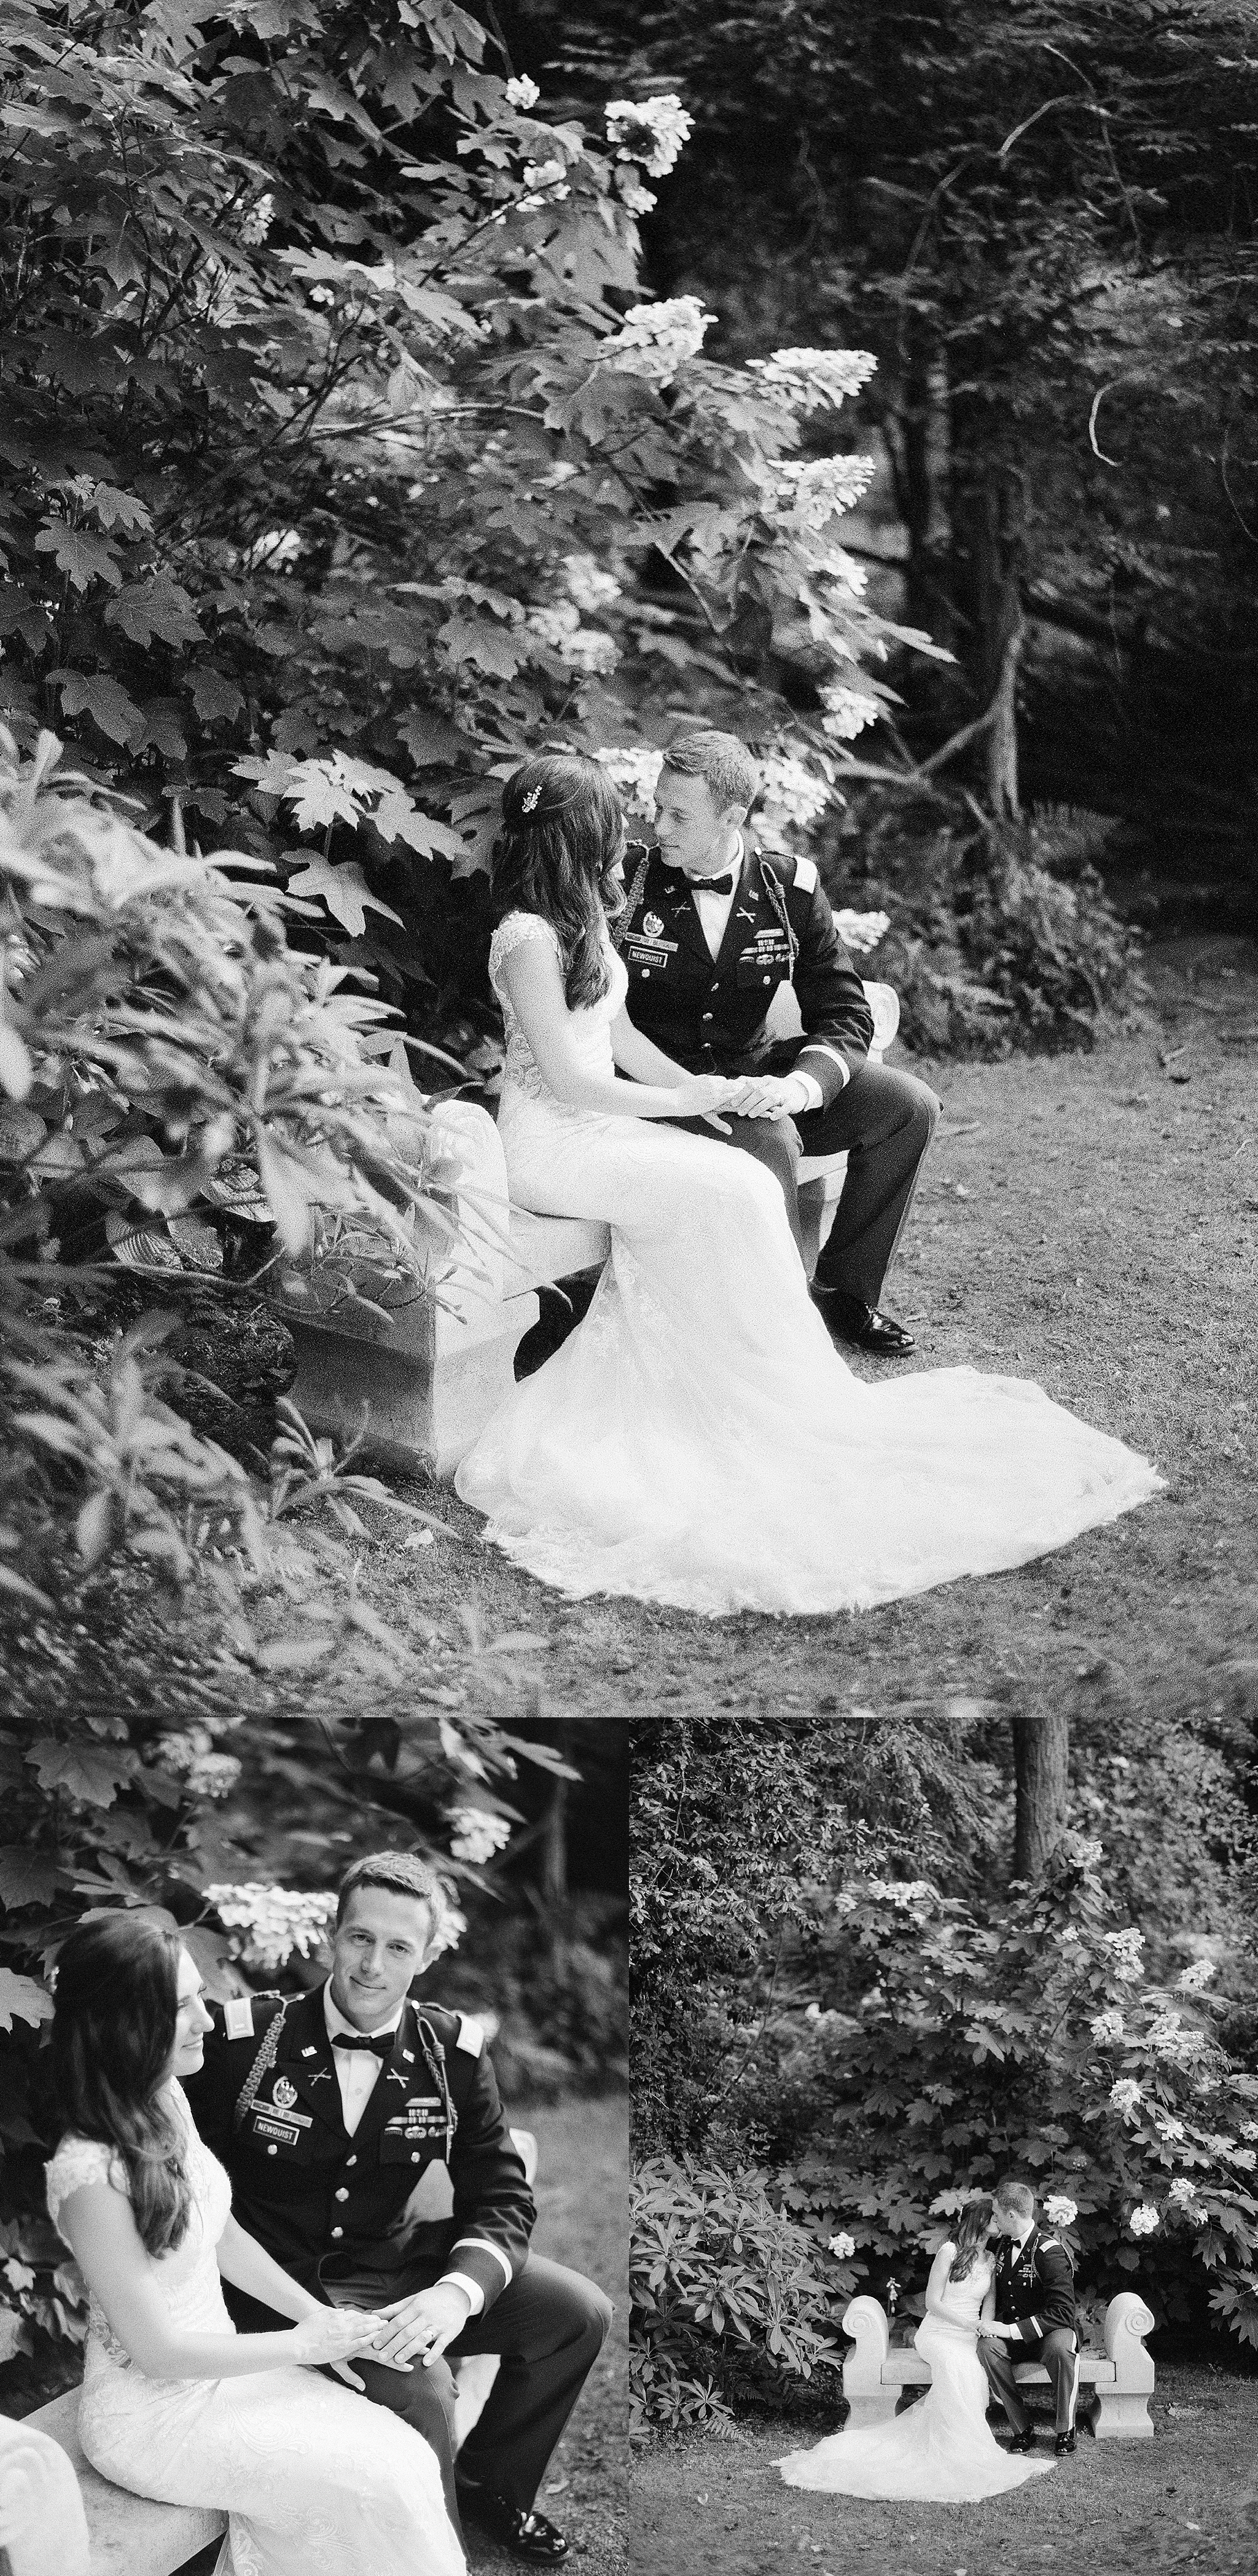 210-dunaway-gardens-newquist-wedding-000005240004.jpg